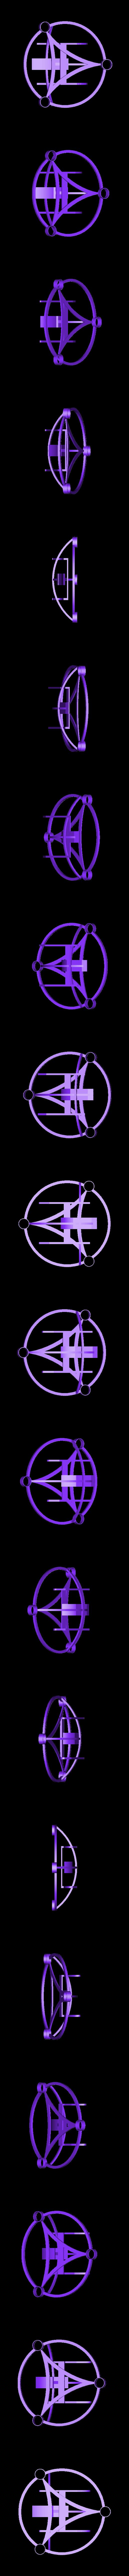 Drone_1.21-_solo.STL Download free STL file Sacred Geometry Drone VTOL Frame • 3D printer design, AlbertKhan3D